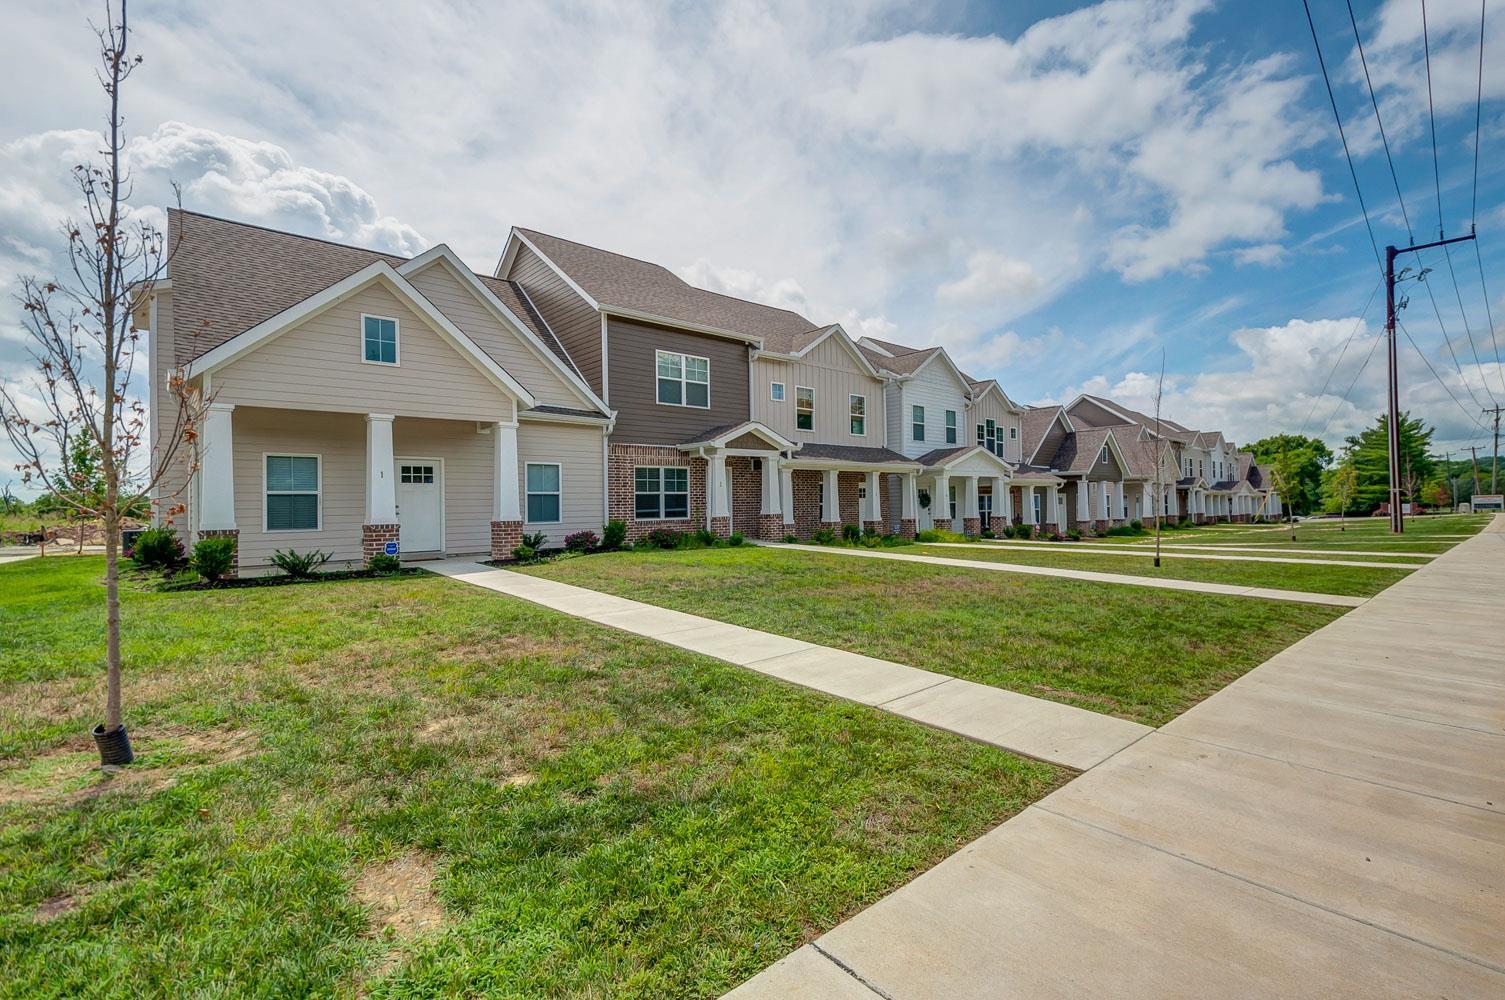 830 Ashland Place Dr, Nashville, TN 37218 - Nashville, TN real estate listing